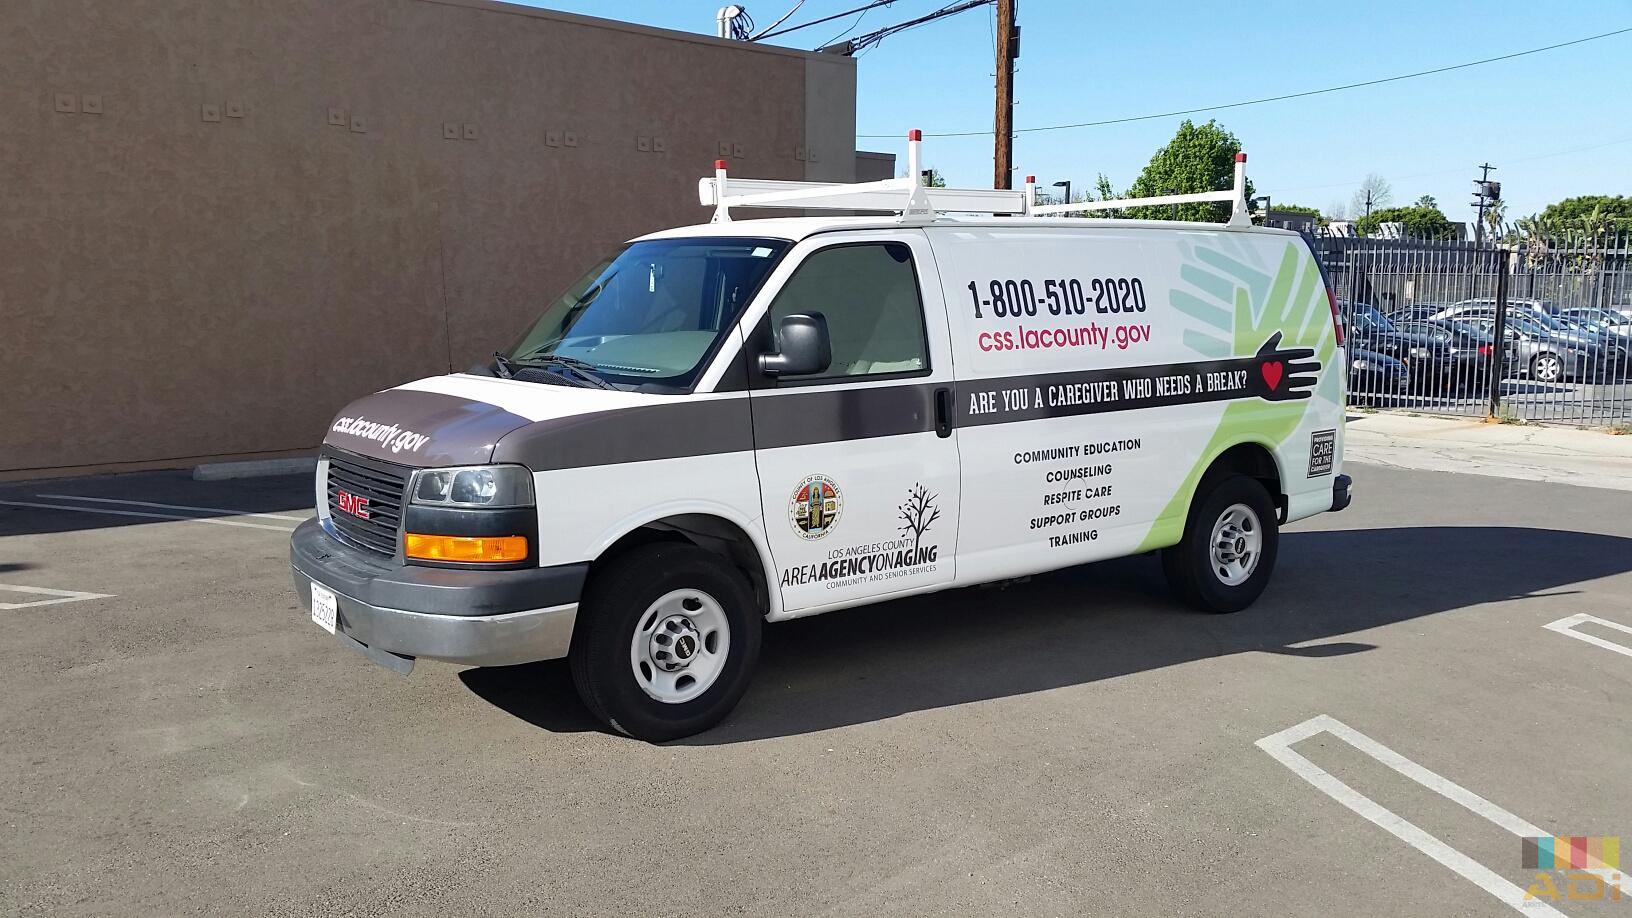 LA County Agency for Age Van Wraps